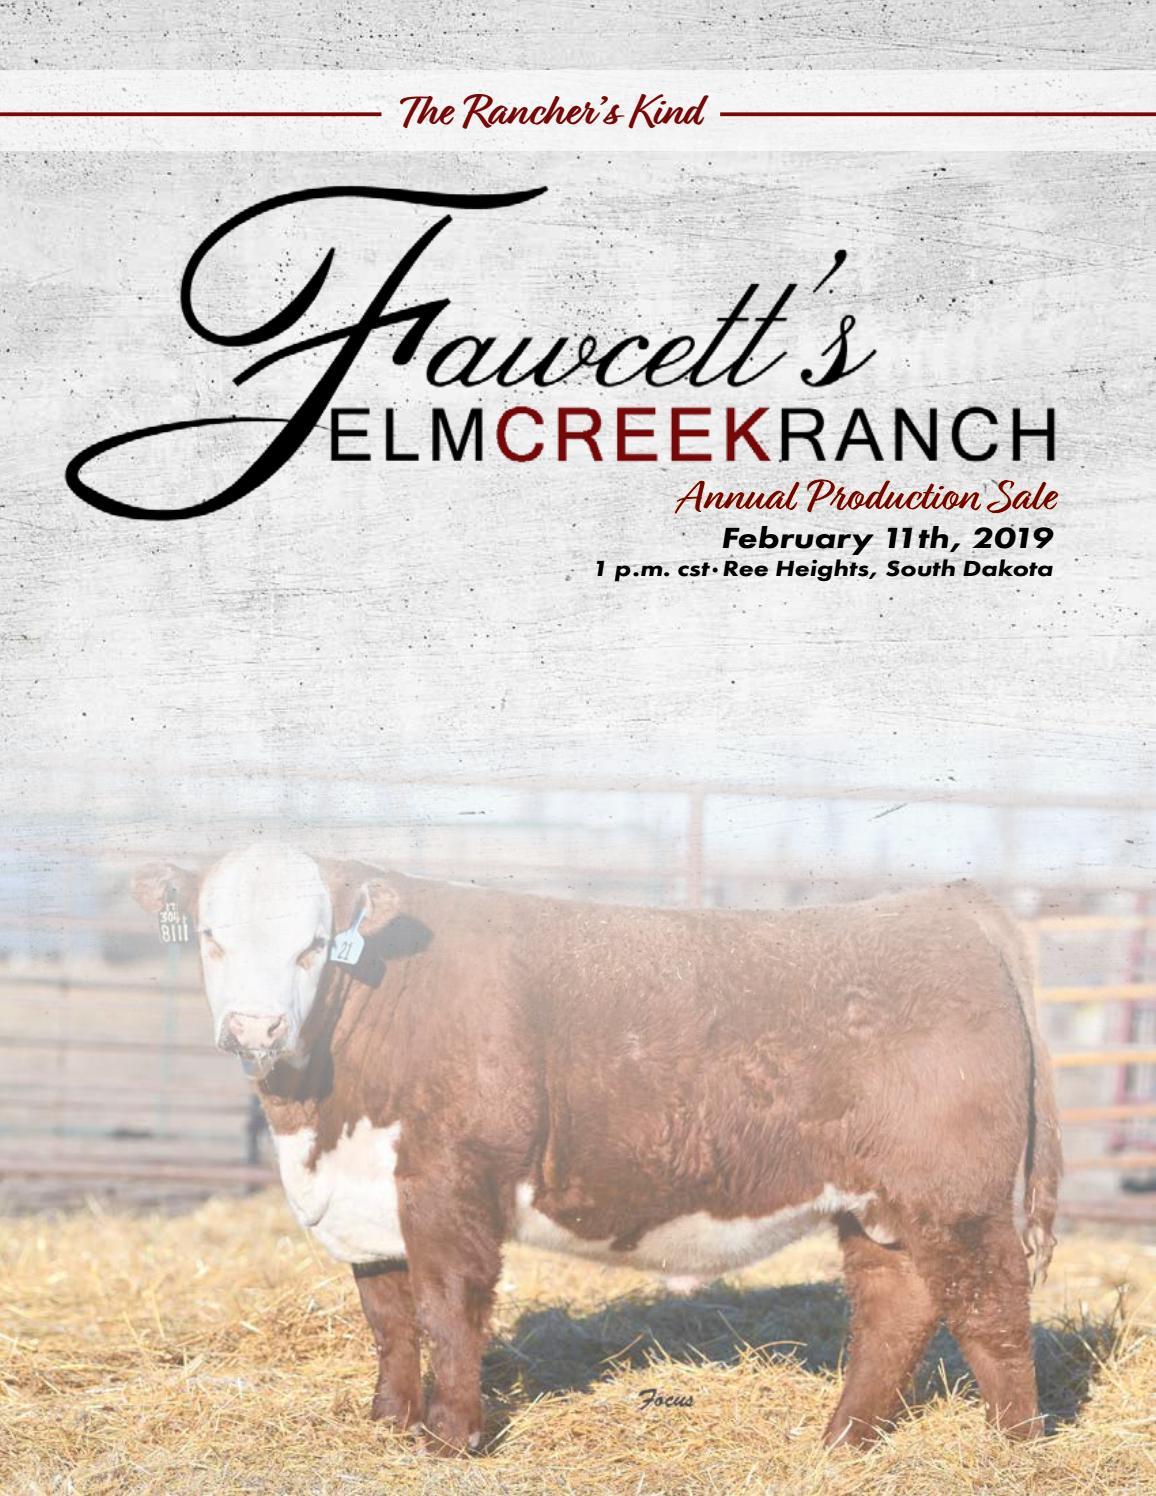 Fawcett's Elm Creek Ranch Annual Production Sale :: 2019 by